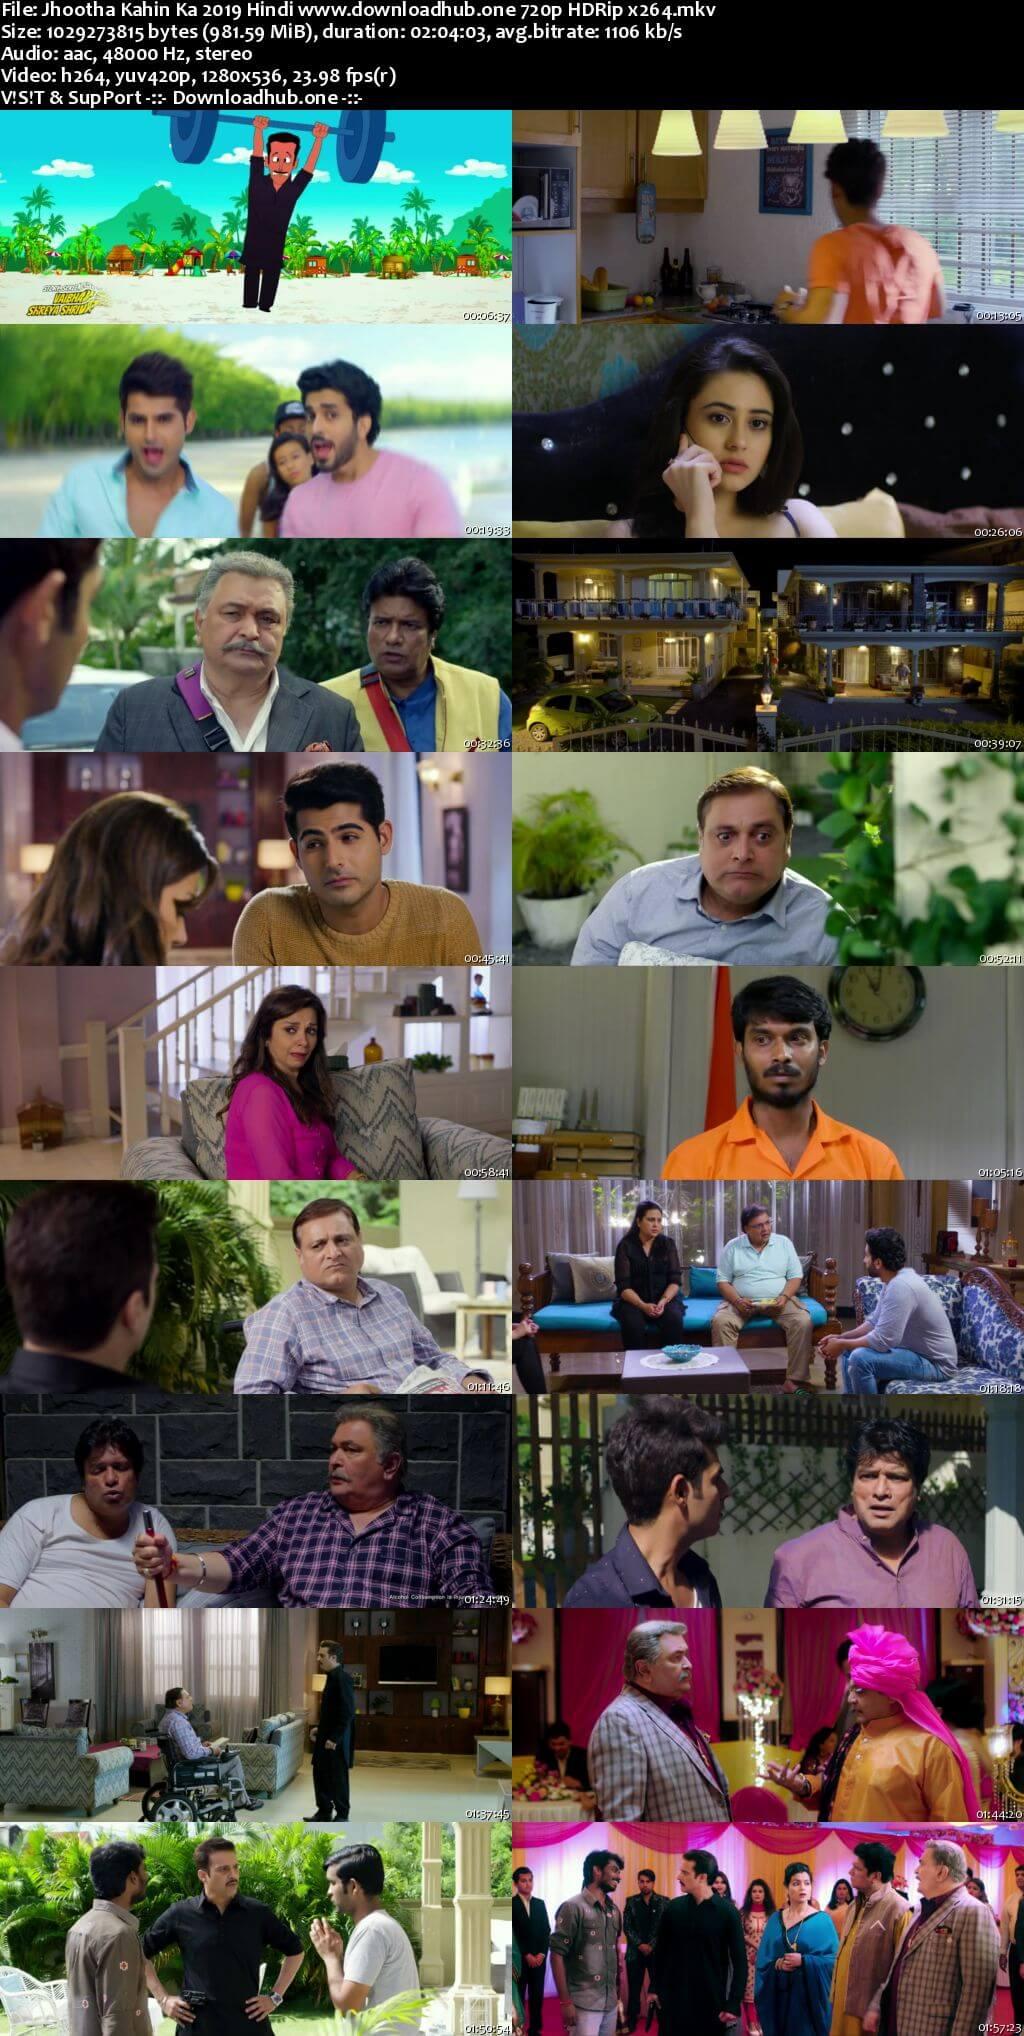 Jhootha Kahin Ka 2019 Hindi 720p HDRip x264